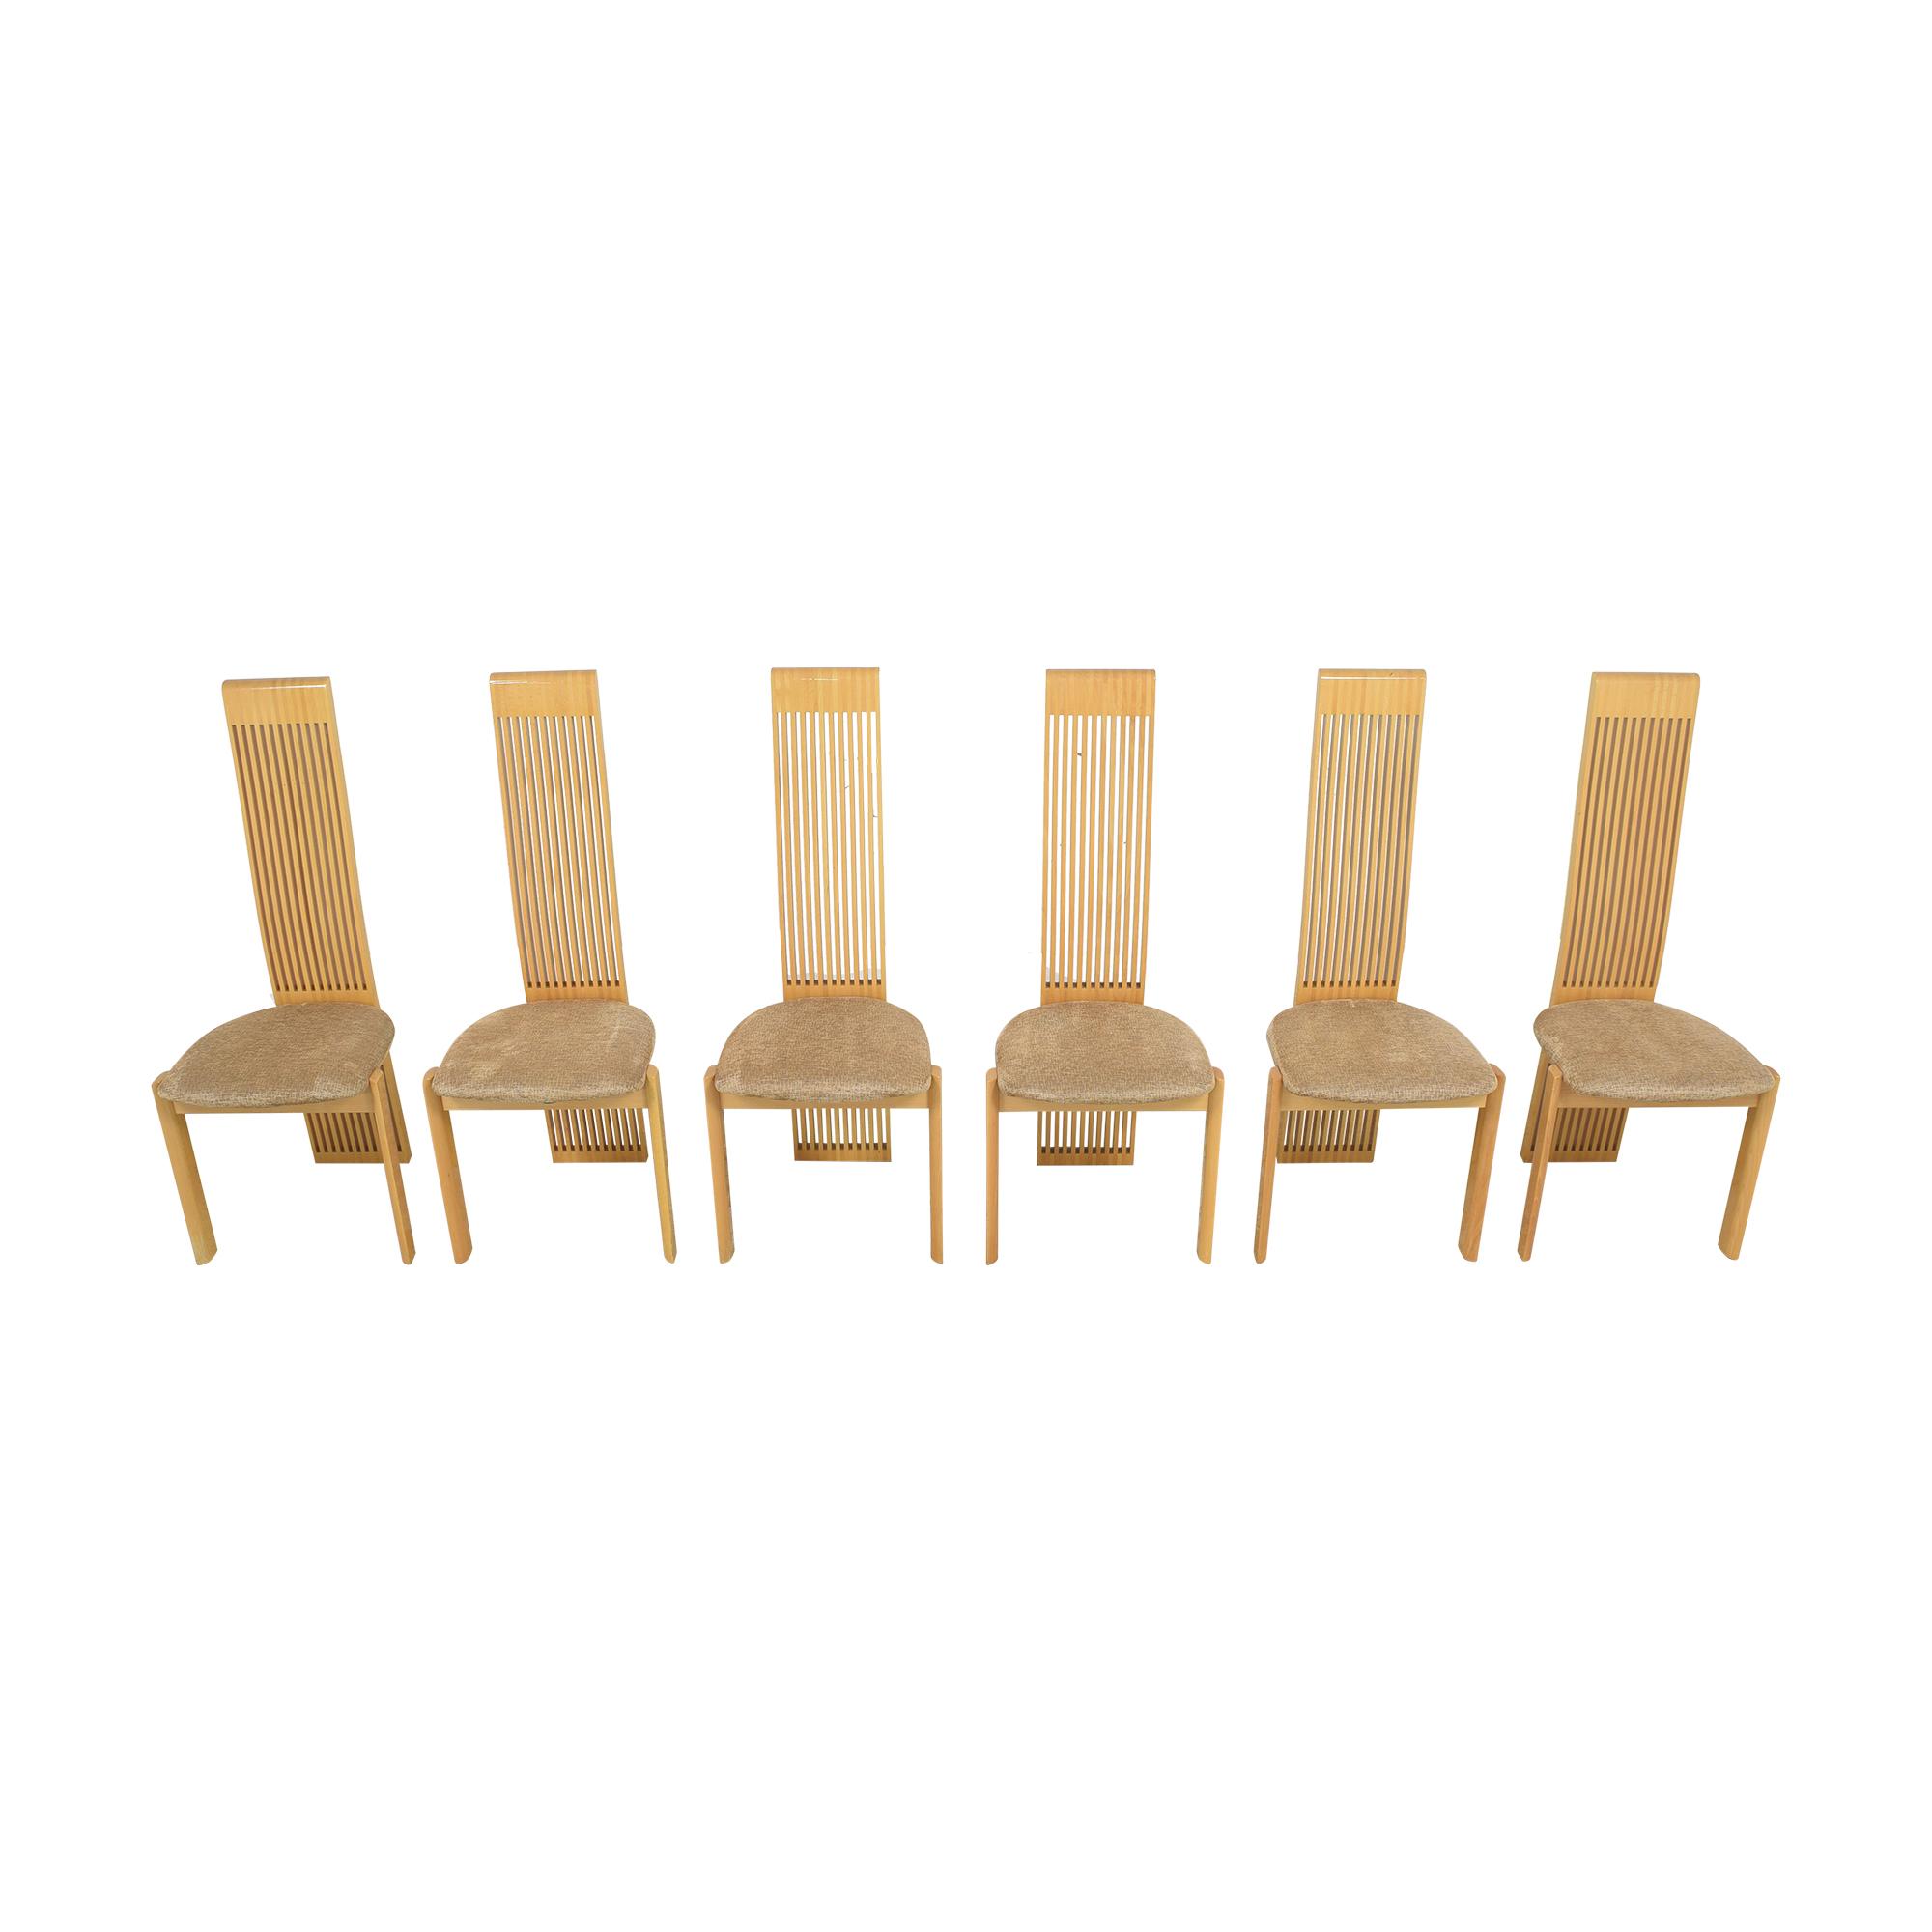 Pietro Costantini Pietro Costantini High Back Dining Chairs on sale